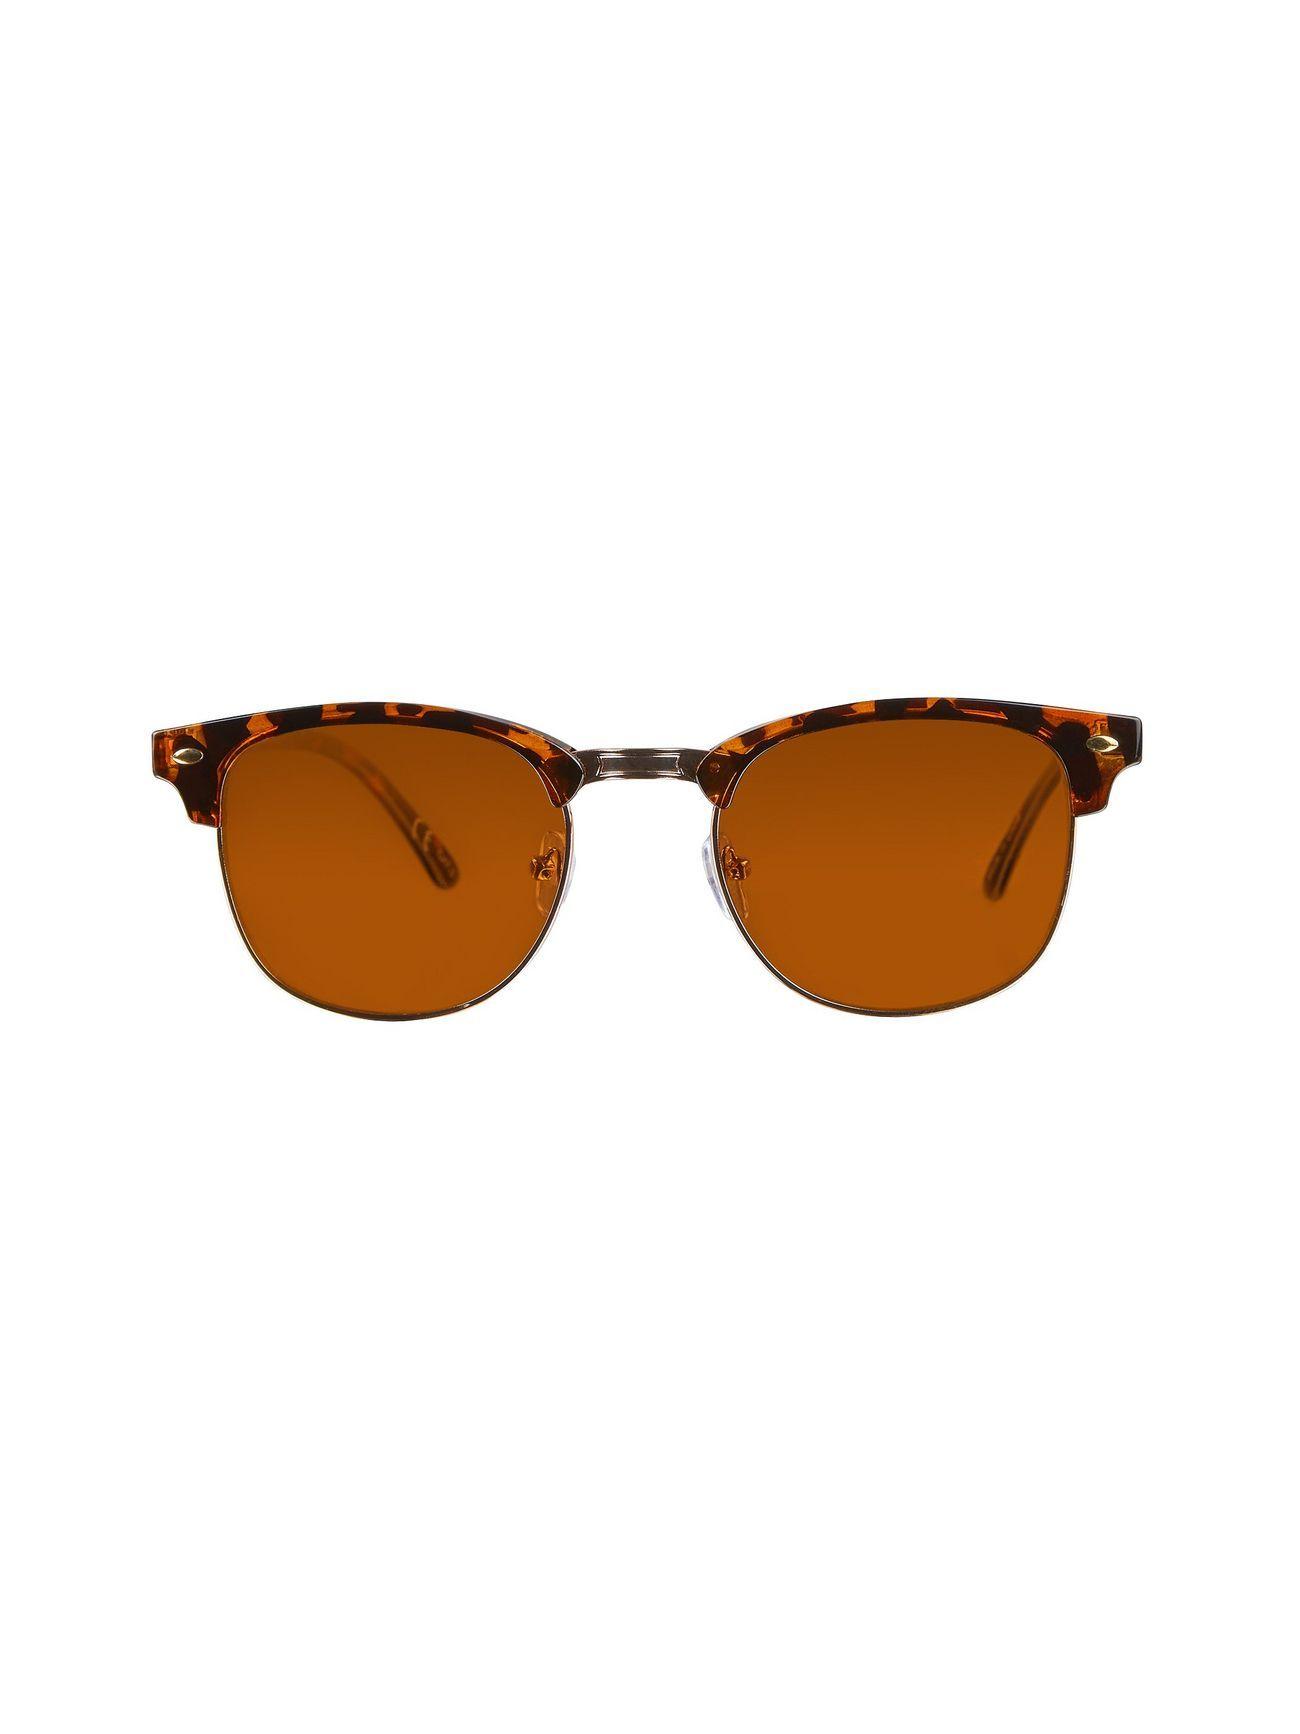 Brown tortoise shell retro sunglasses retro sunglasses